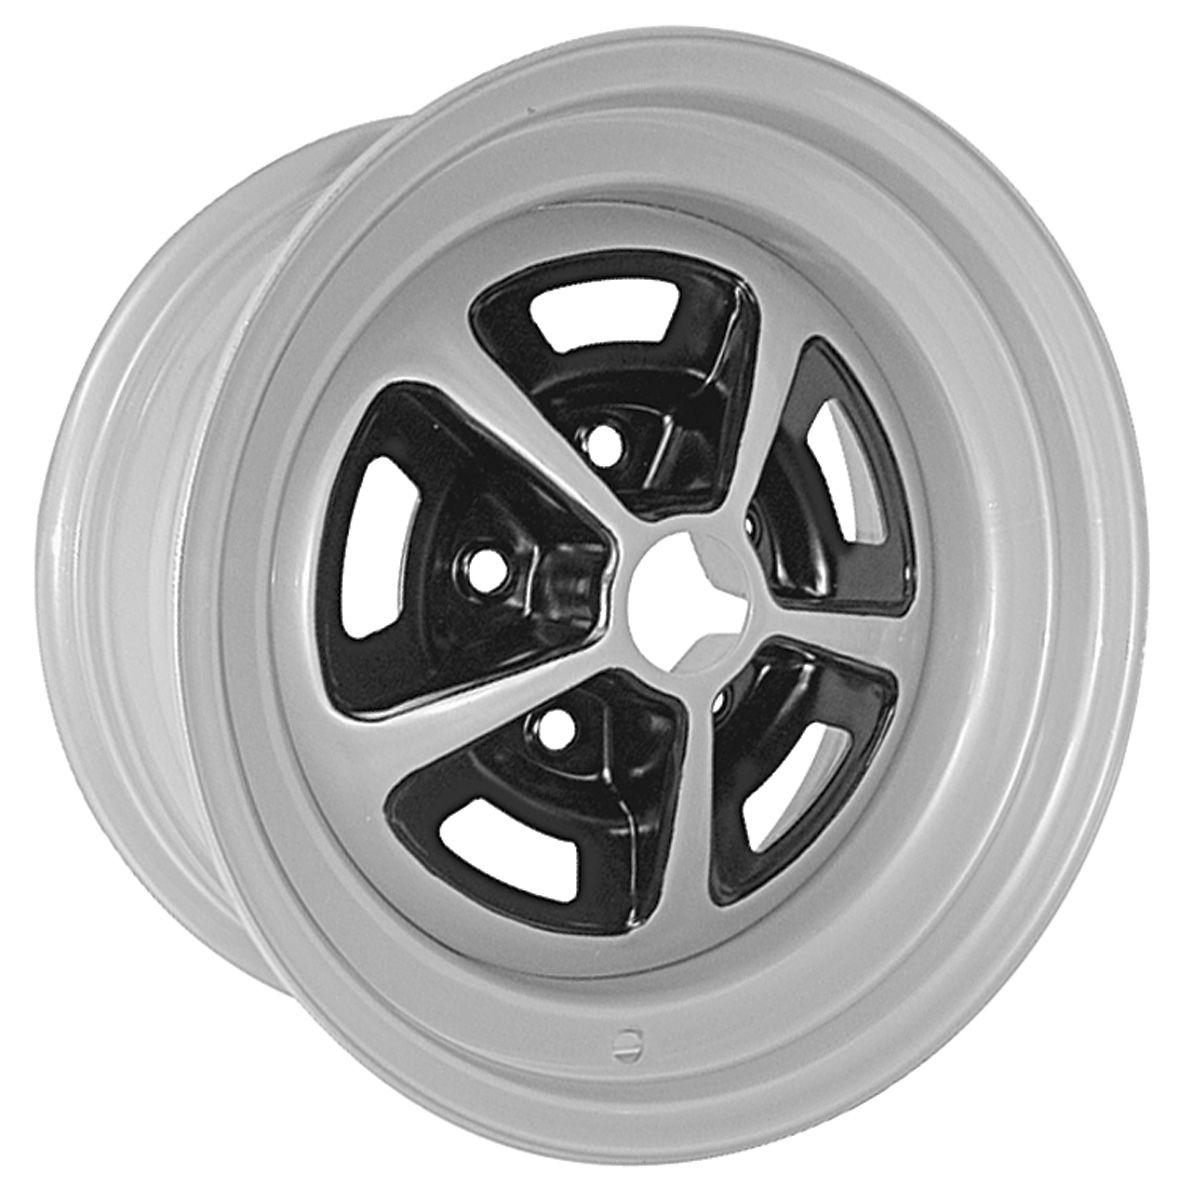 "Wheel, Super Sport, 14X7, 4-3/8"" Back Spacing"